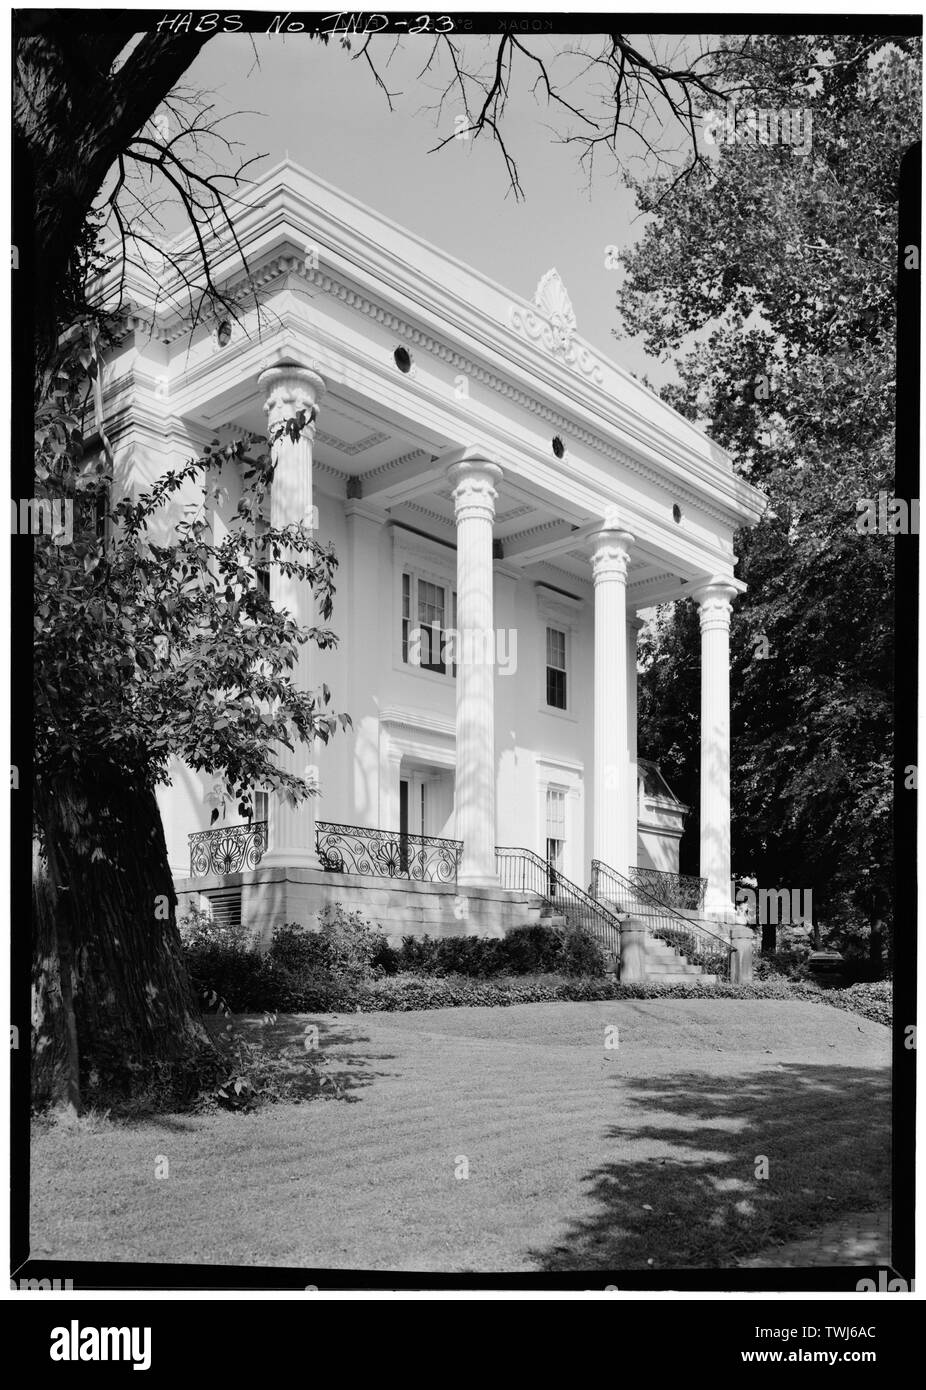 September 1971 DETAIL OF CUPOLA - James E. D. Lanier House, 511 West First Street, Madison, Jefferson County, IN; Costigan, Francis J; Jandoli, Liz, transmitter; Price, Virginia B, transmitter - Stock Image